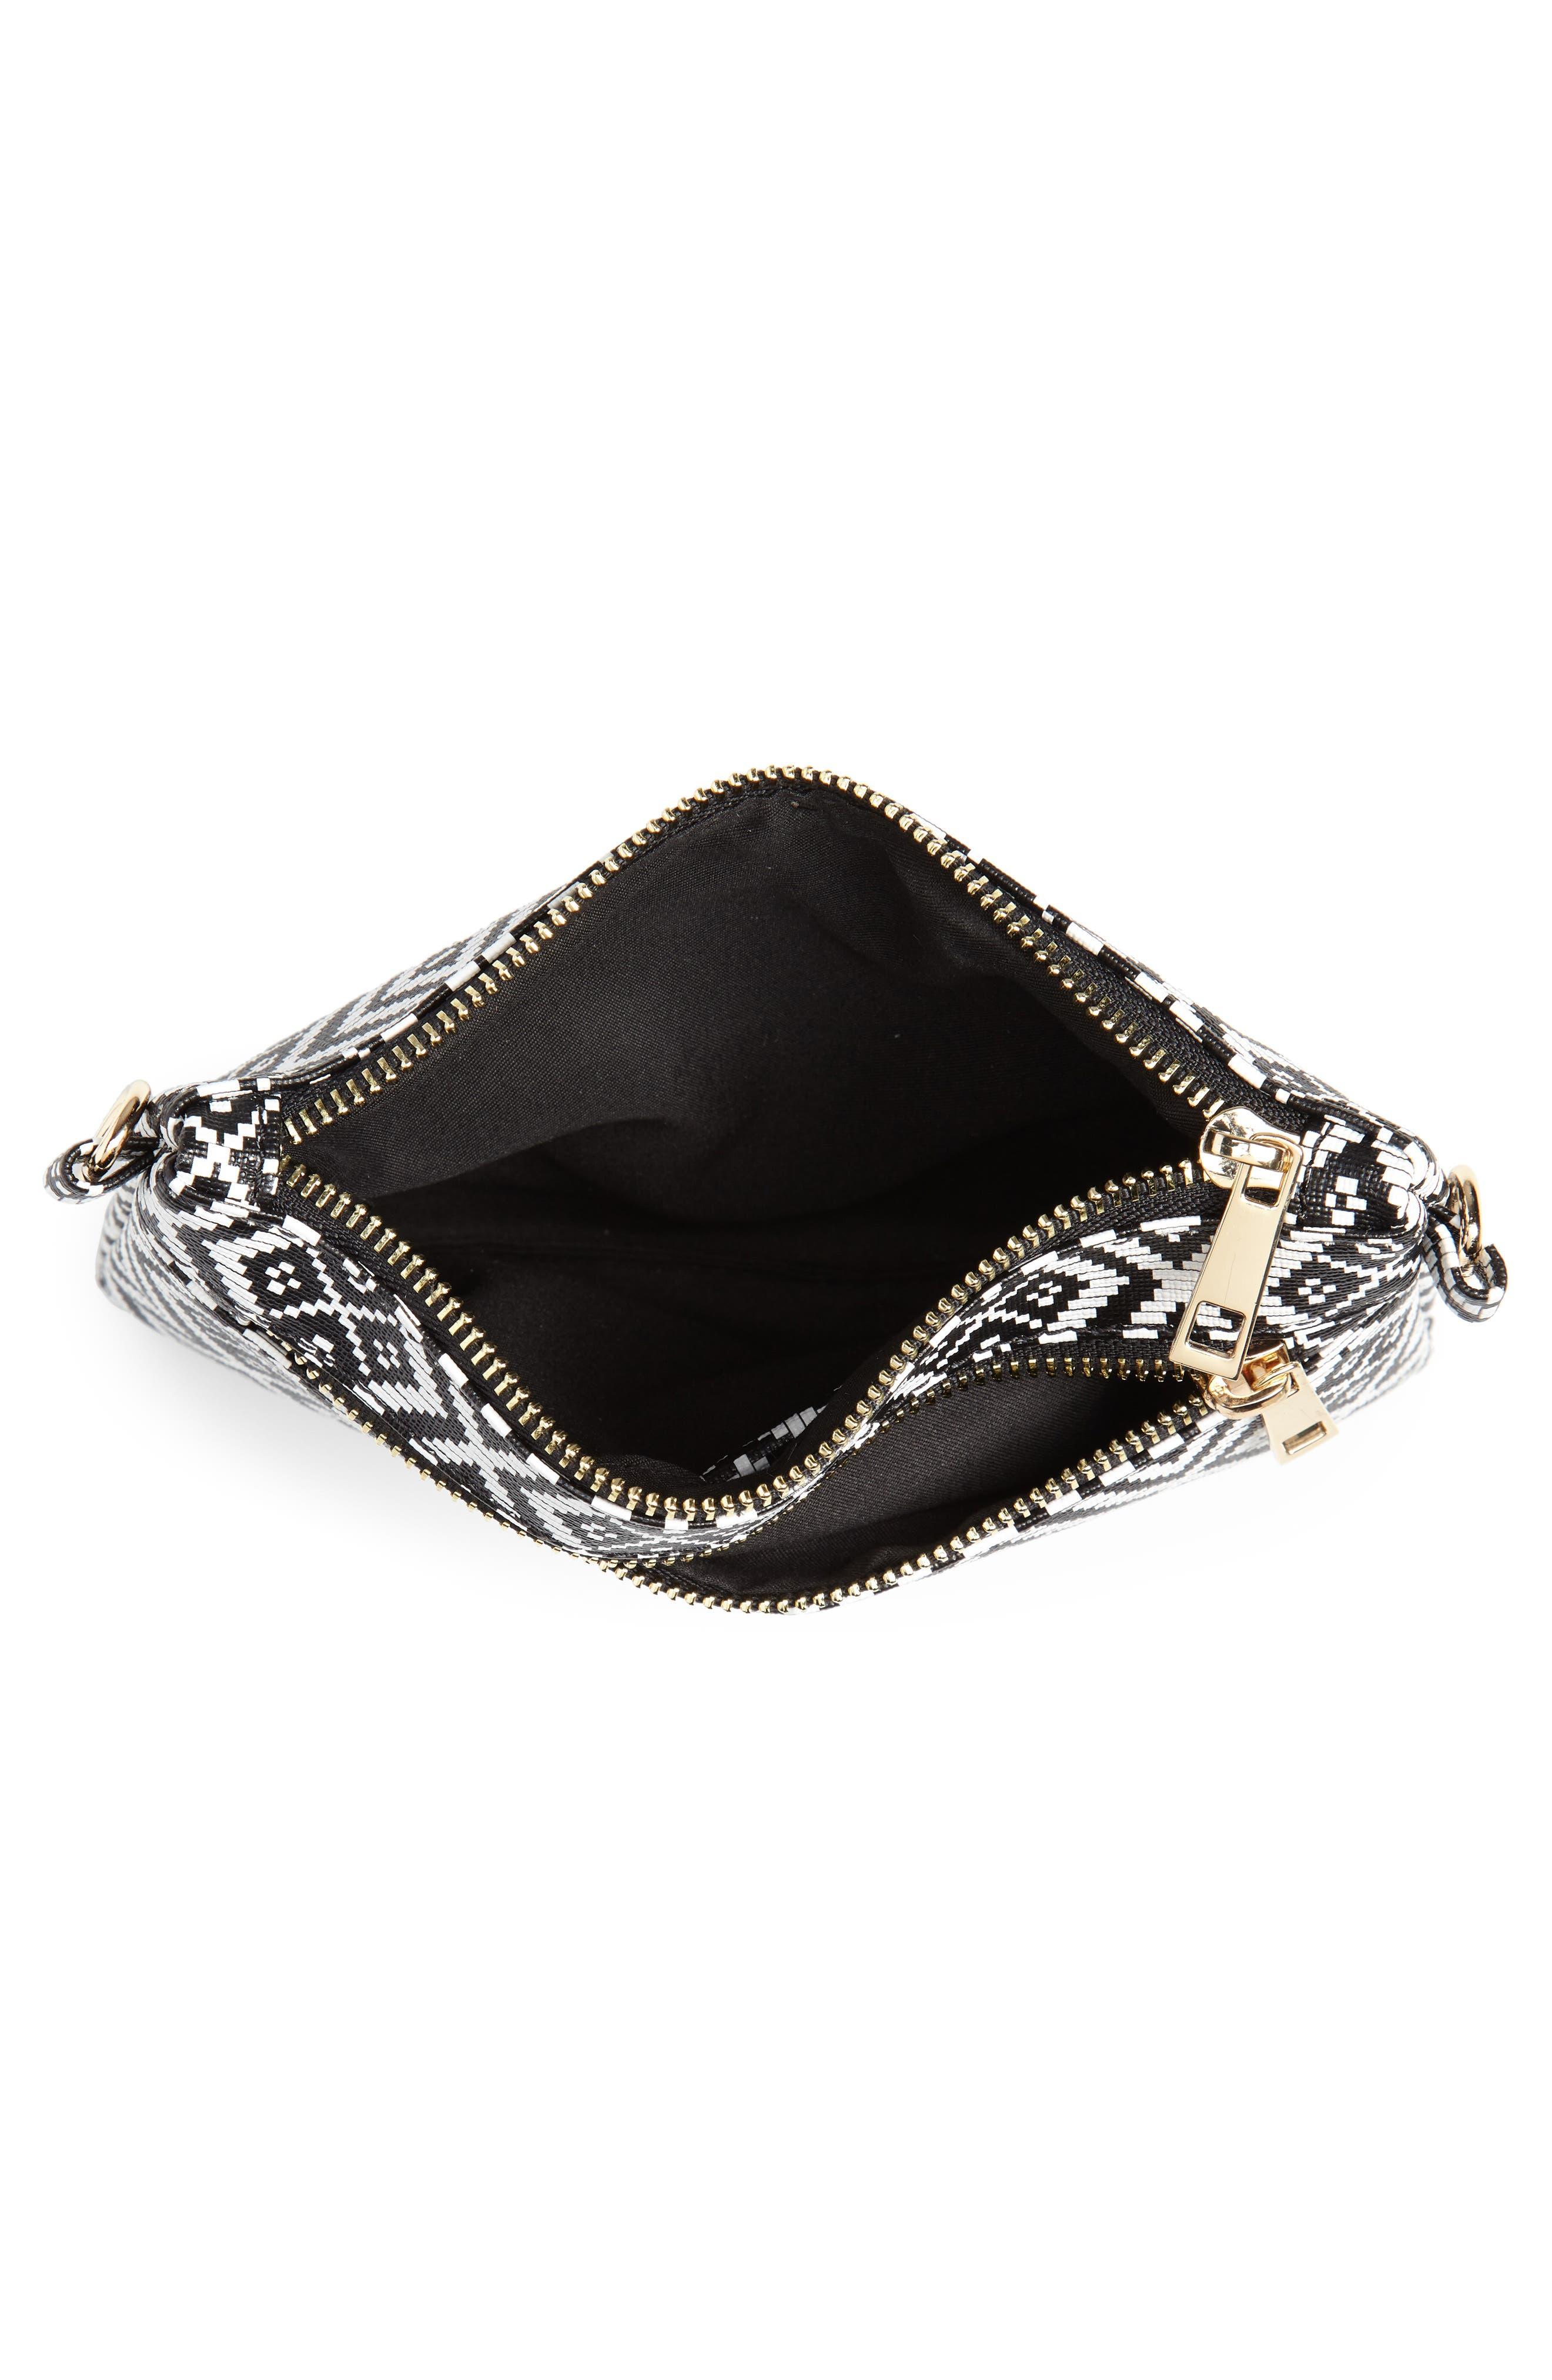 Weave Pattern Convertible Crossbody Wristlet,                             Alternate thumbnail 6, color,                             Black/ White